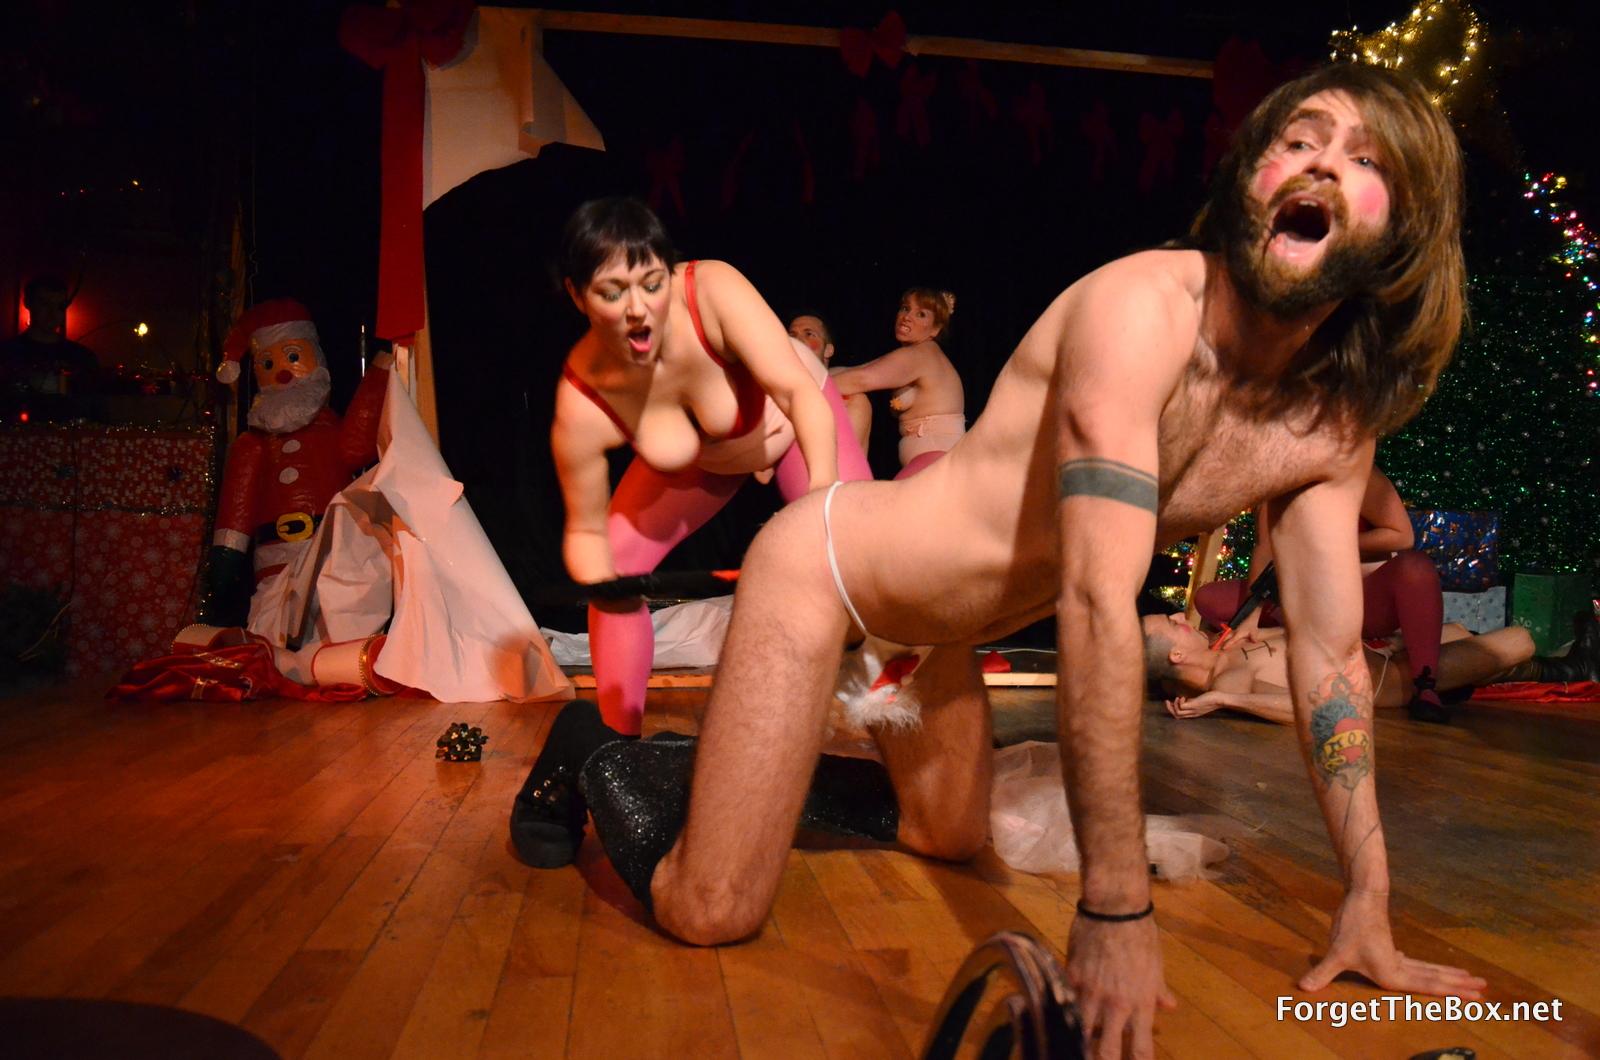 tits the season, indeed - glam gam presents tits the season 2 get